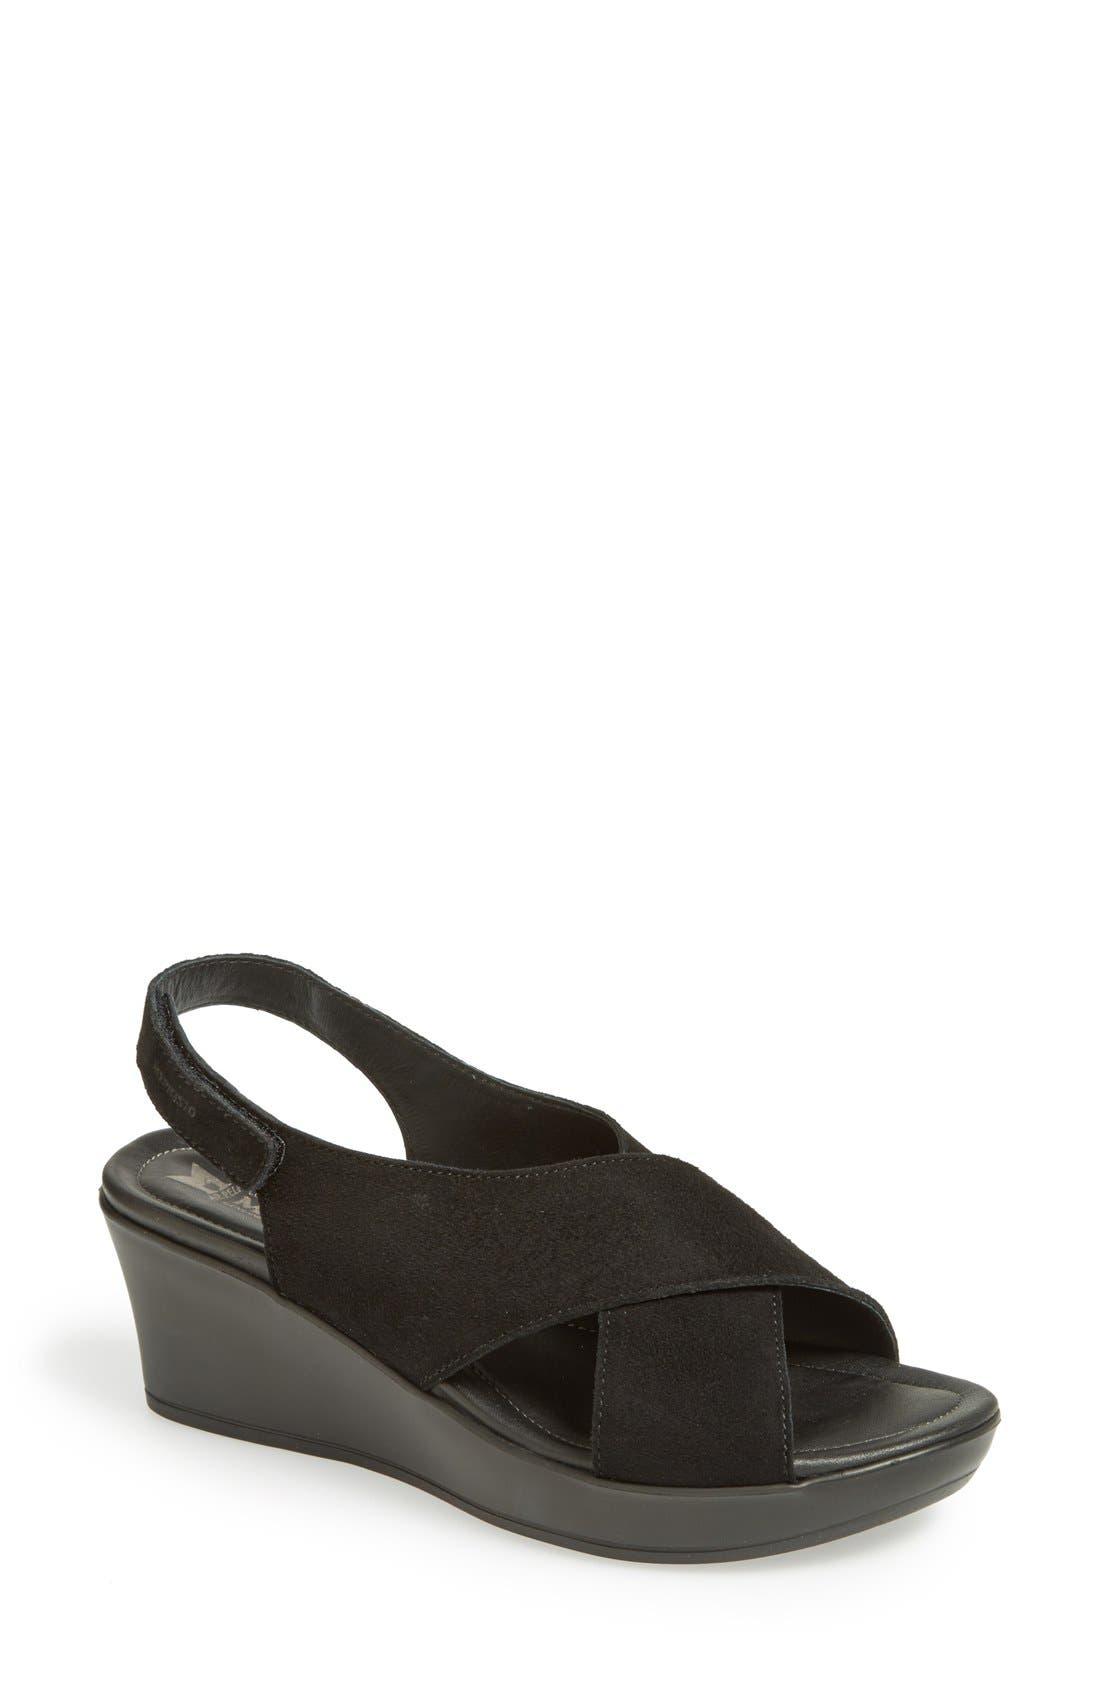 Alternate Image 1 Selected - Mephisto 'Petra' Sandal